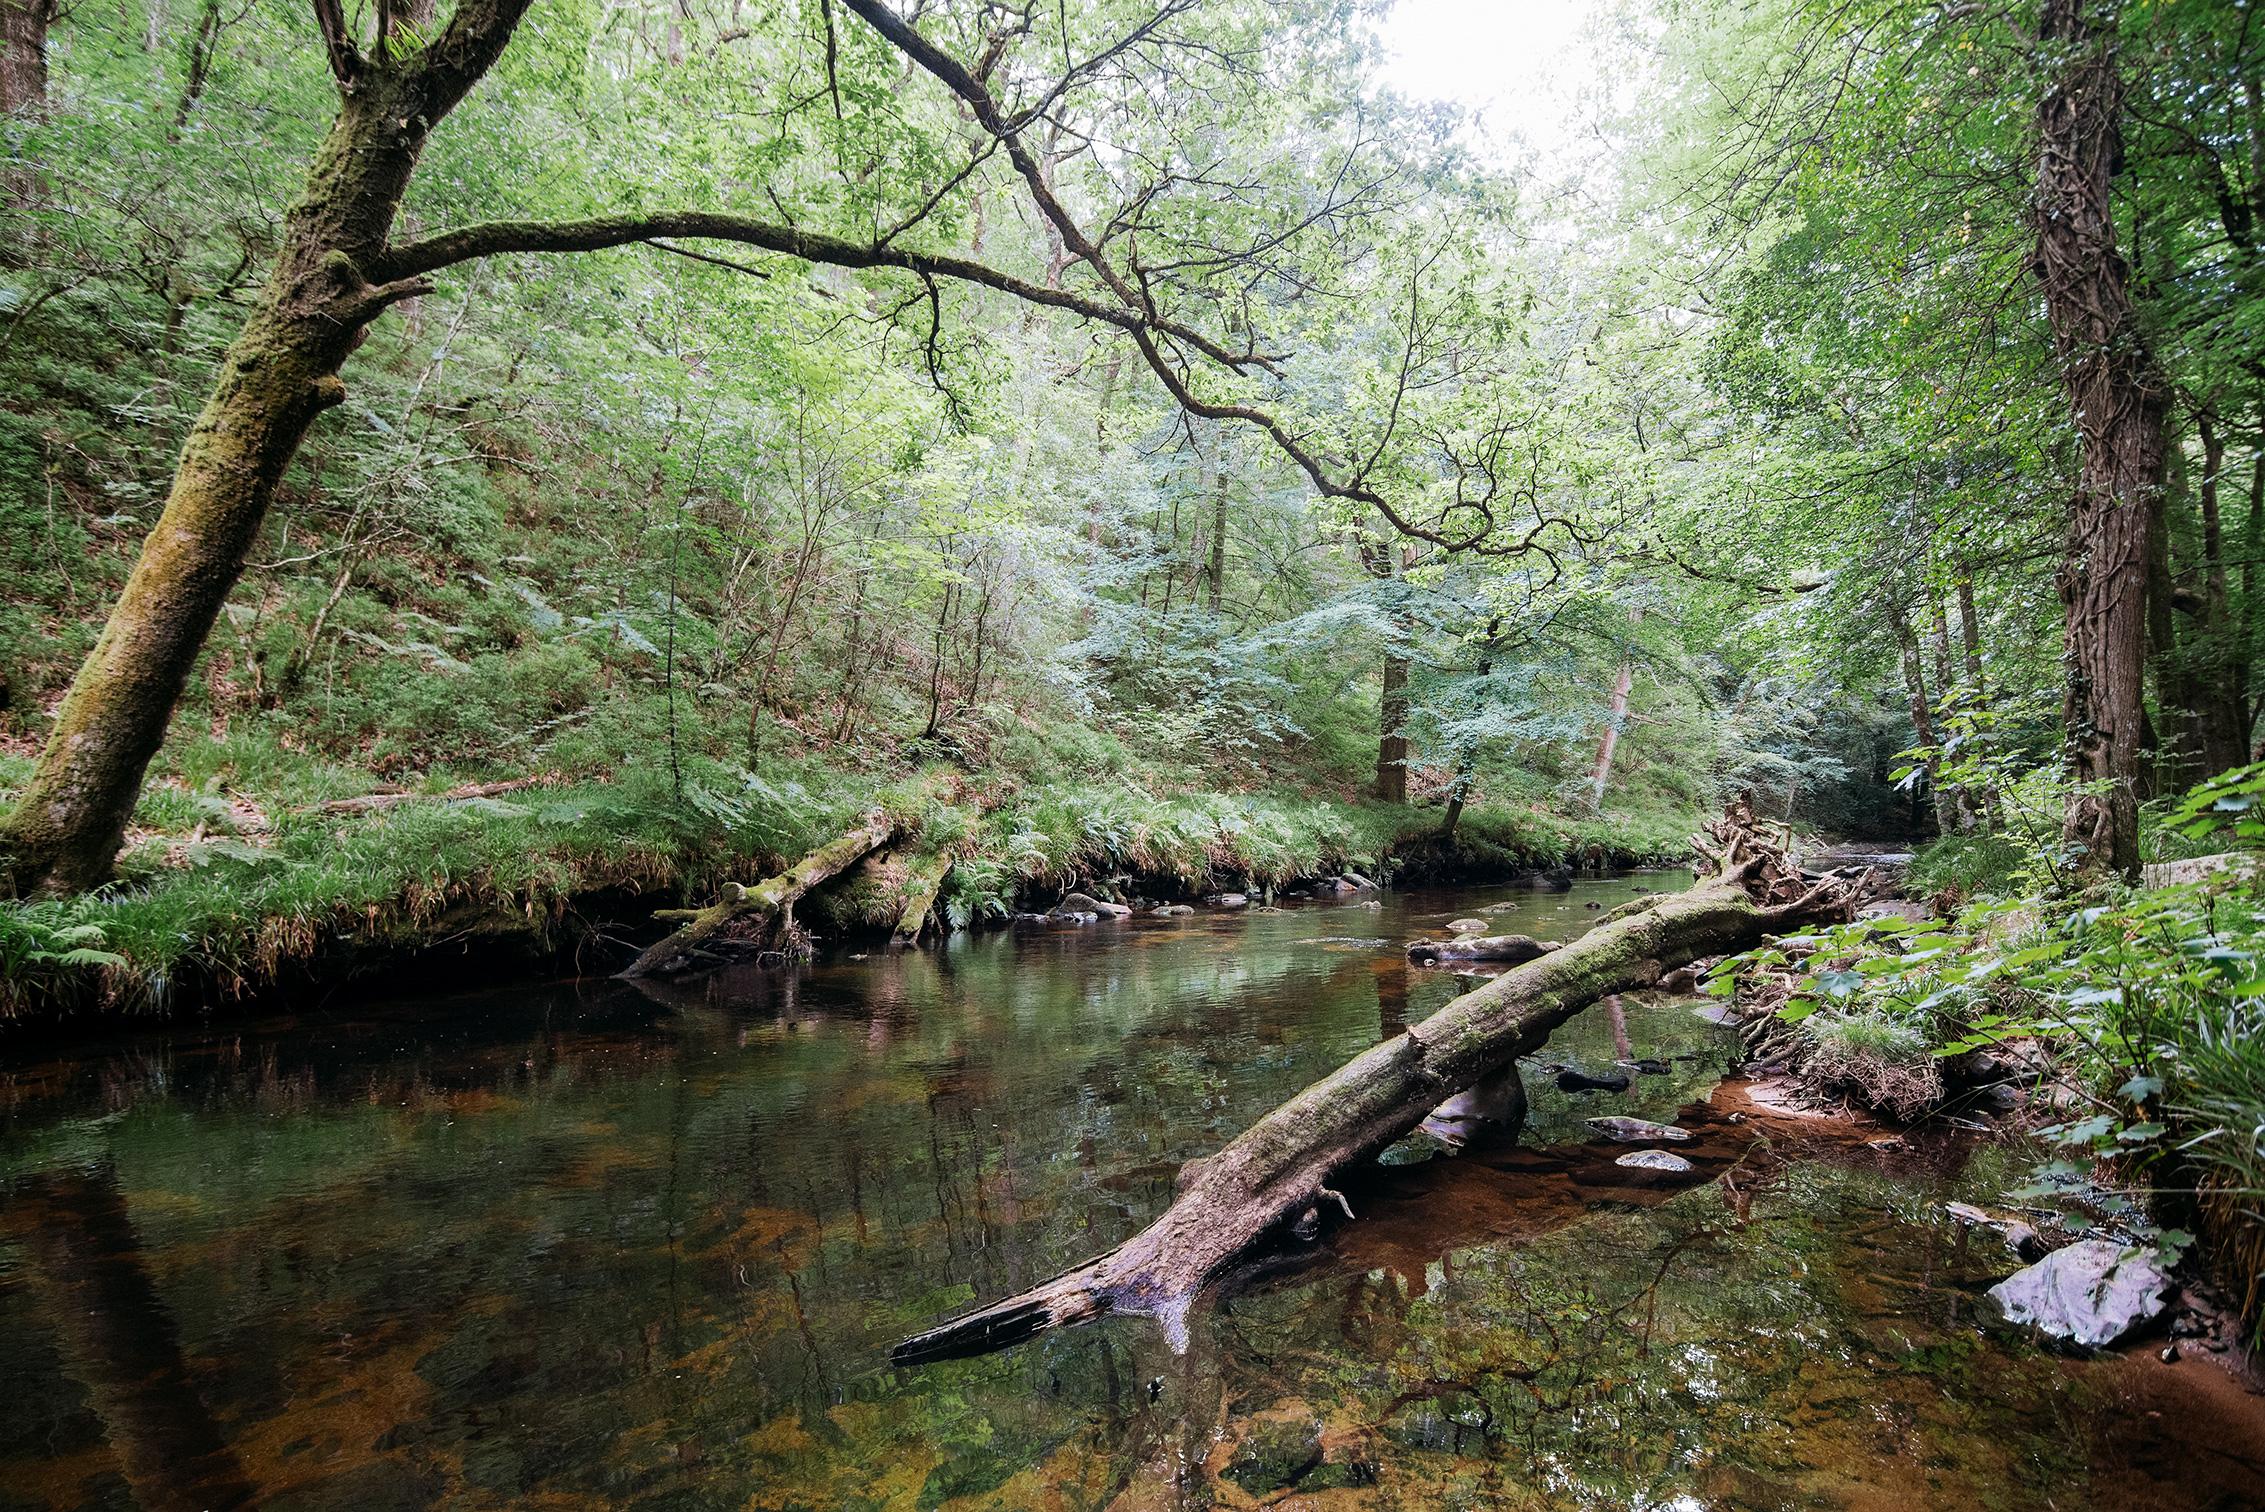 Fingle Bridge Hike (Along The River Teign)